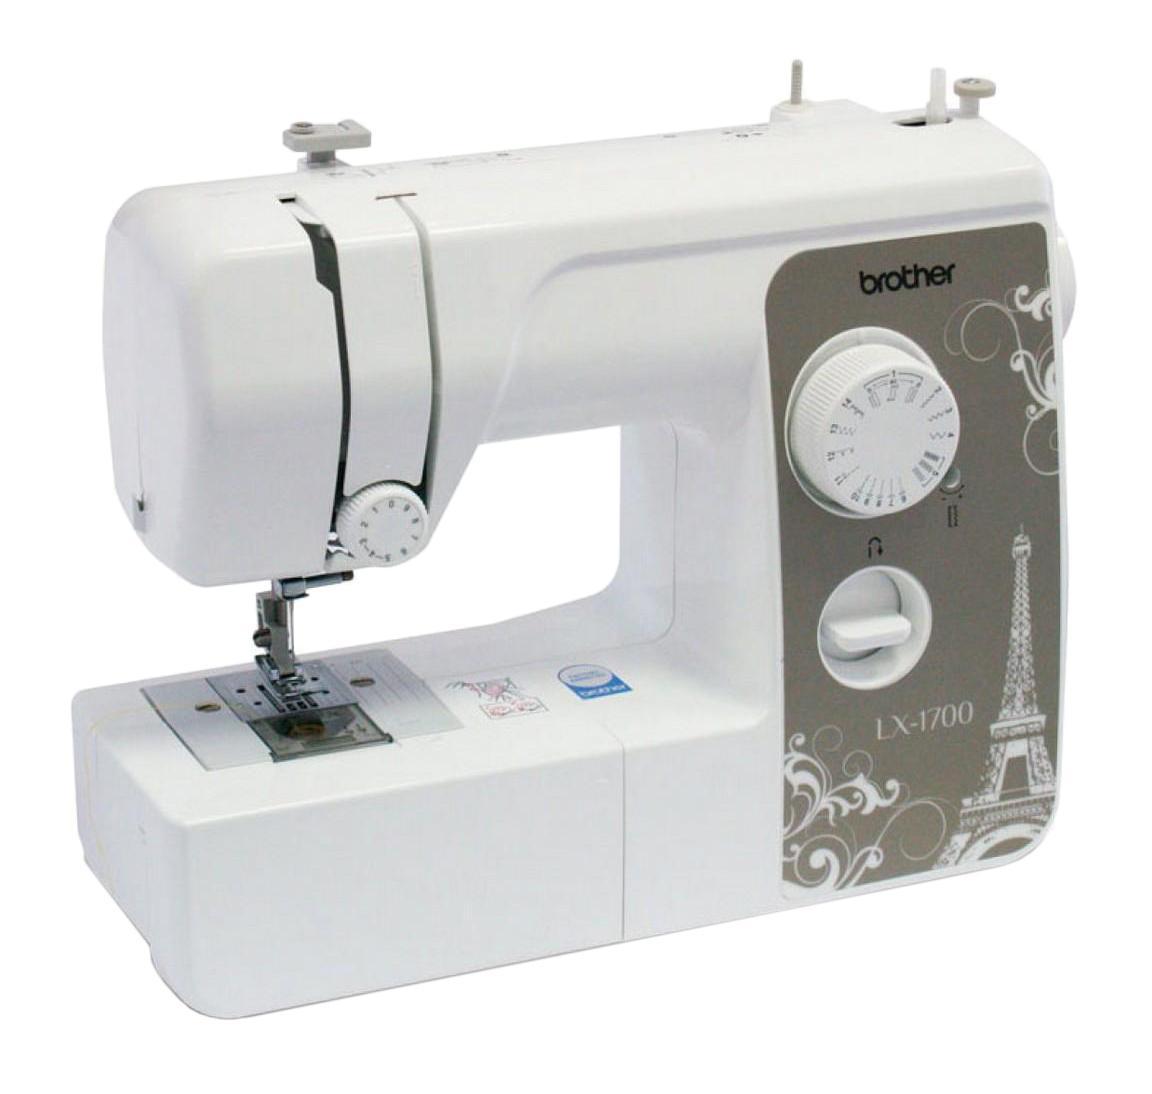 Brother LX-1700 швейная машина779937